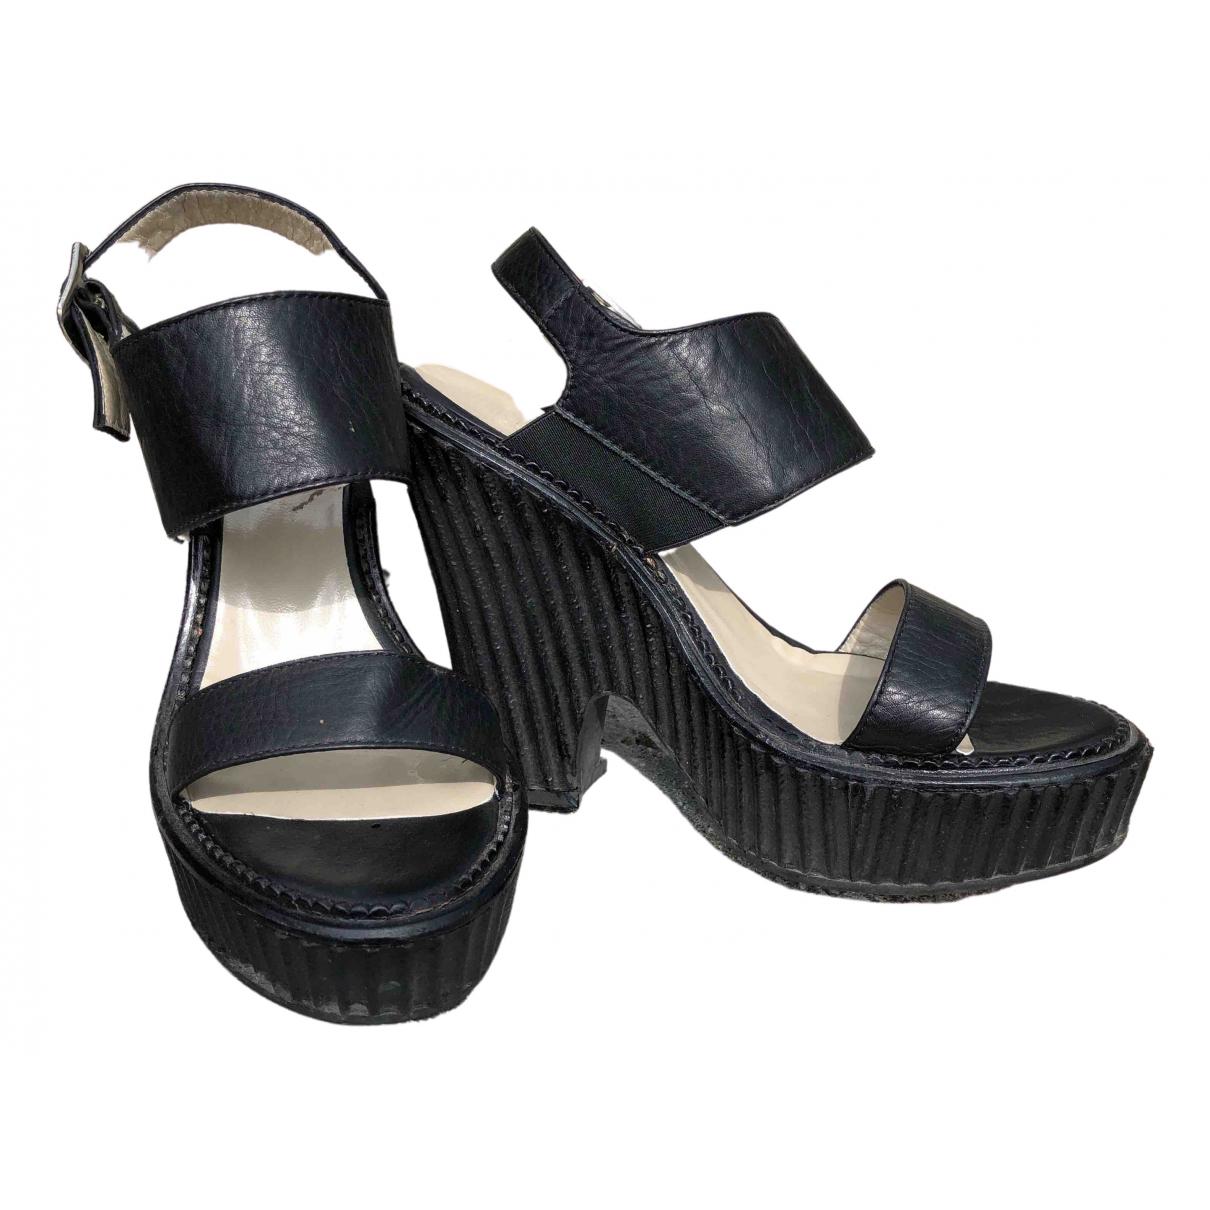 Max Mara \N Black Leather Sandals for Women 38 IT